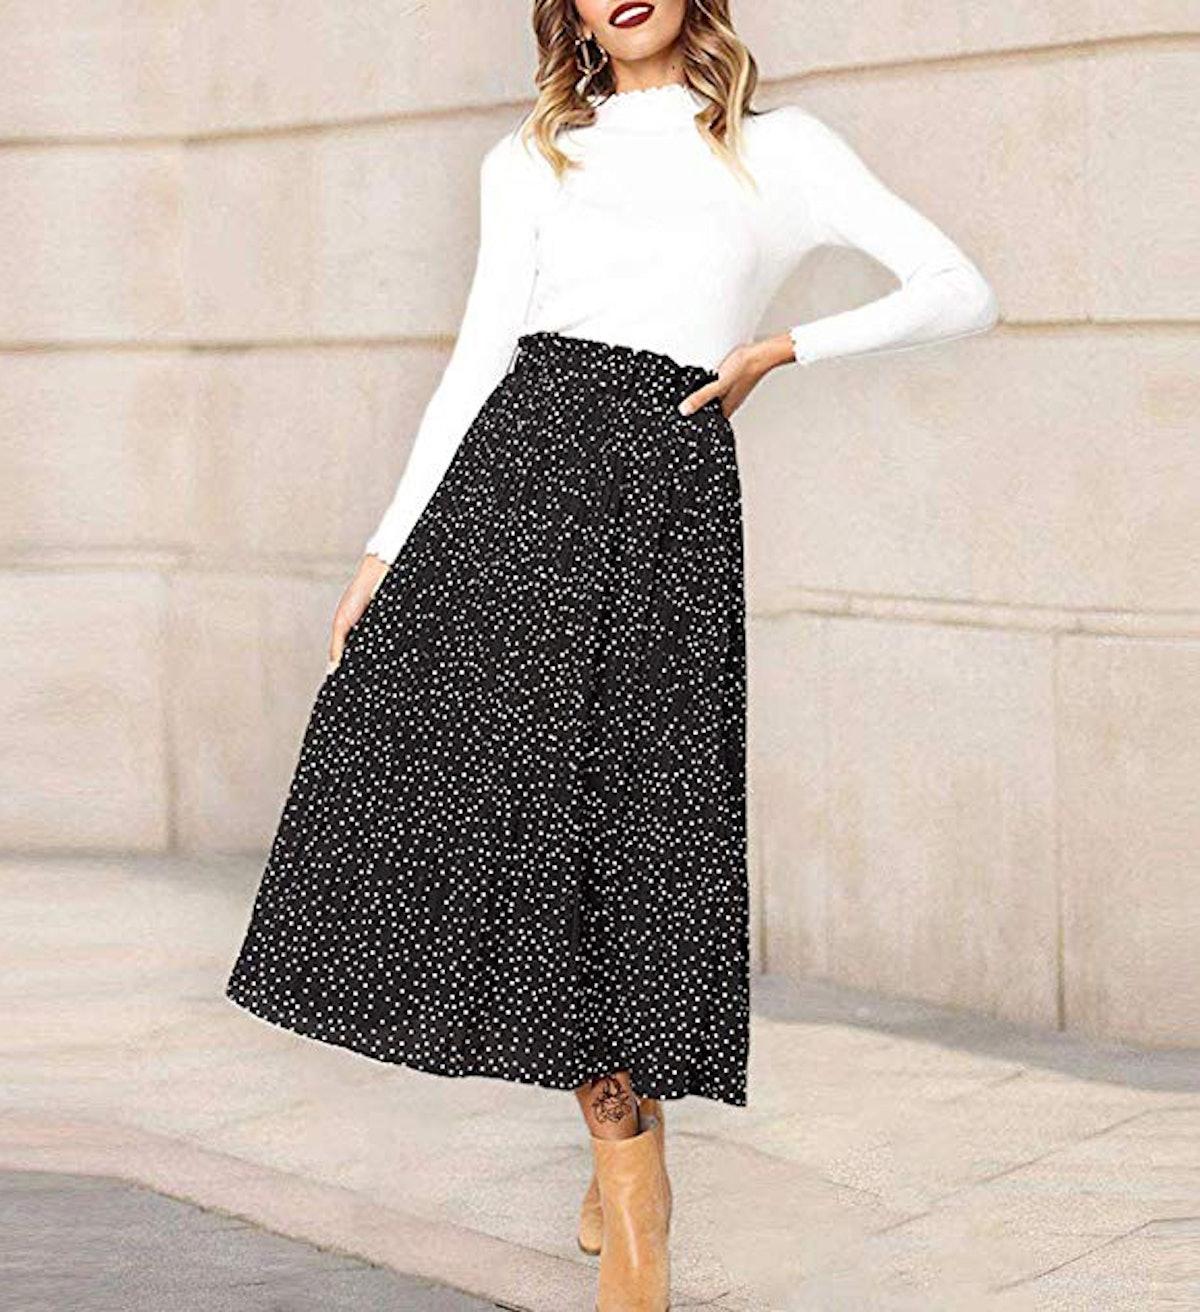 Exlura Womens High Waist Pleated Midi Swing Skirt with Pockets